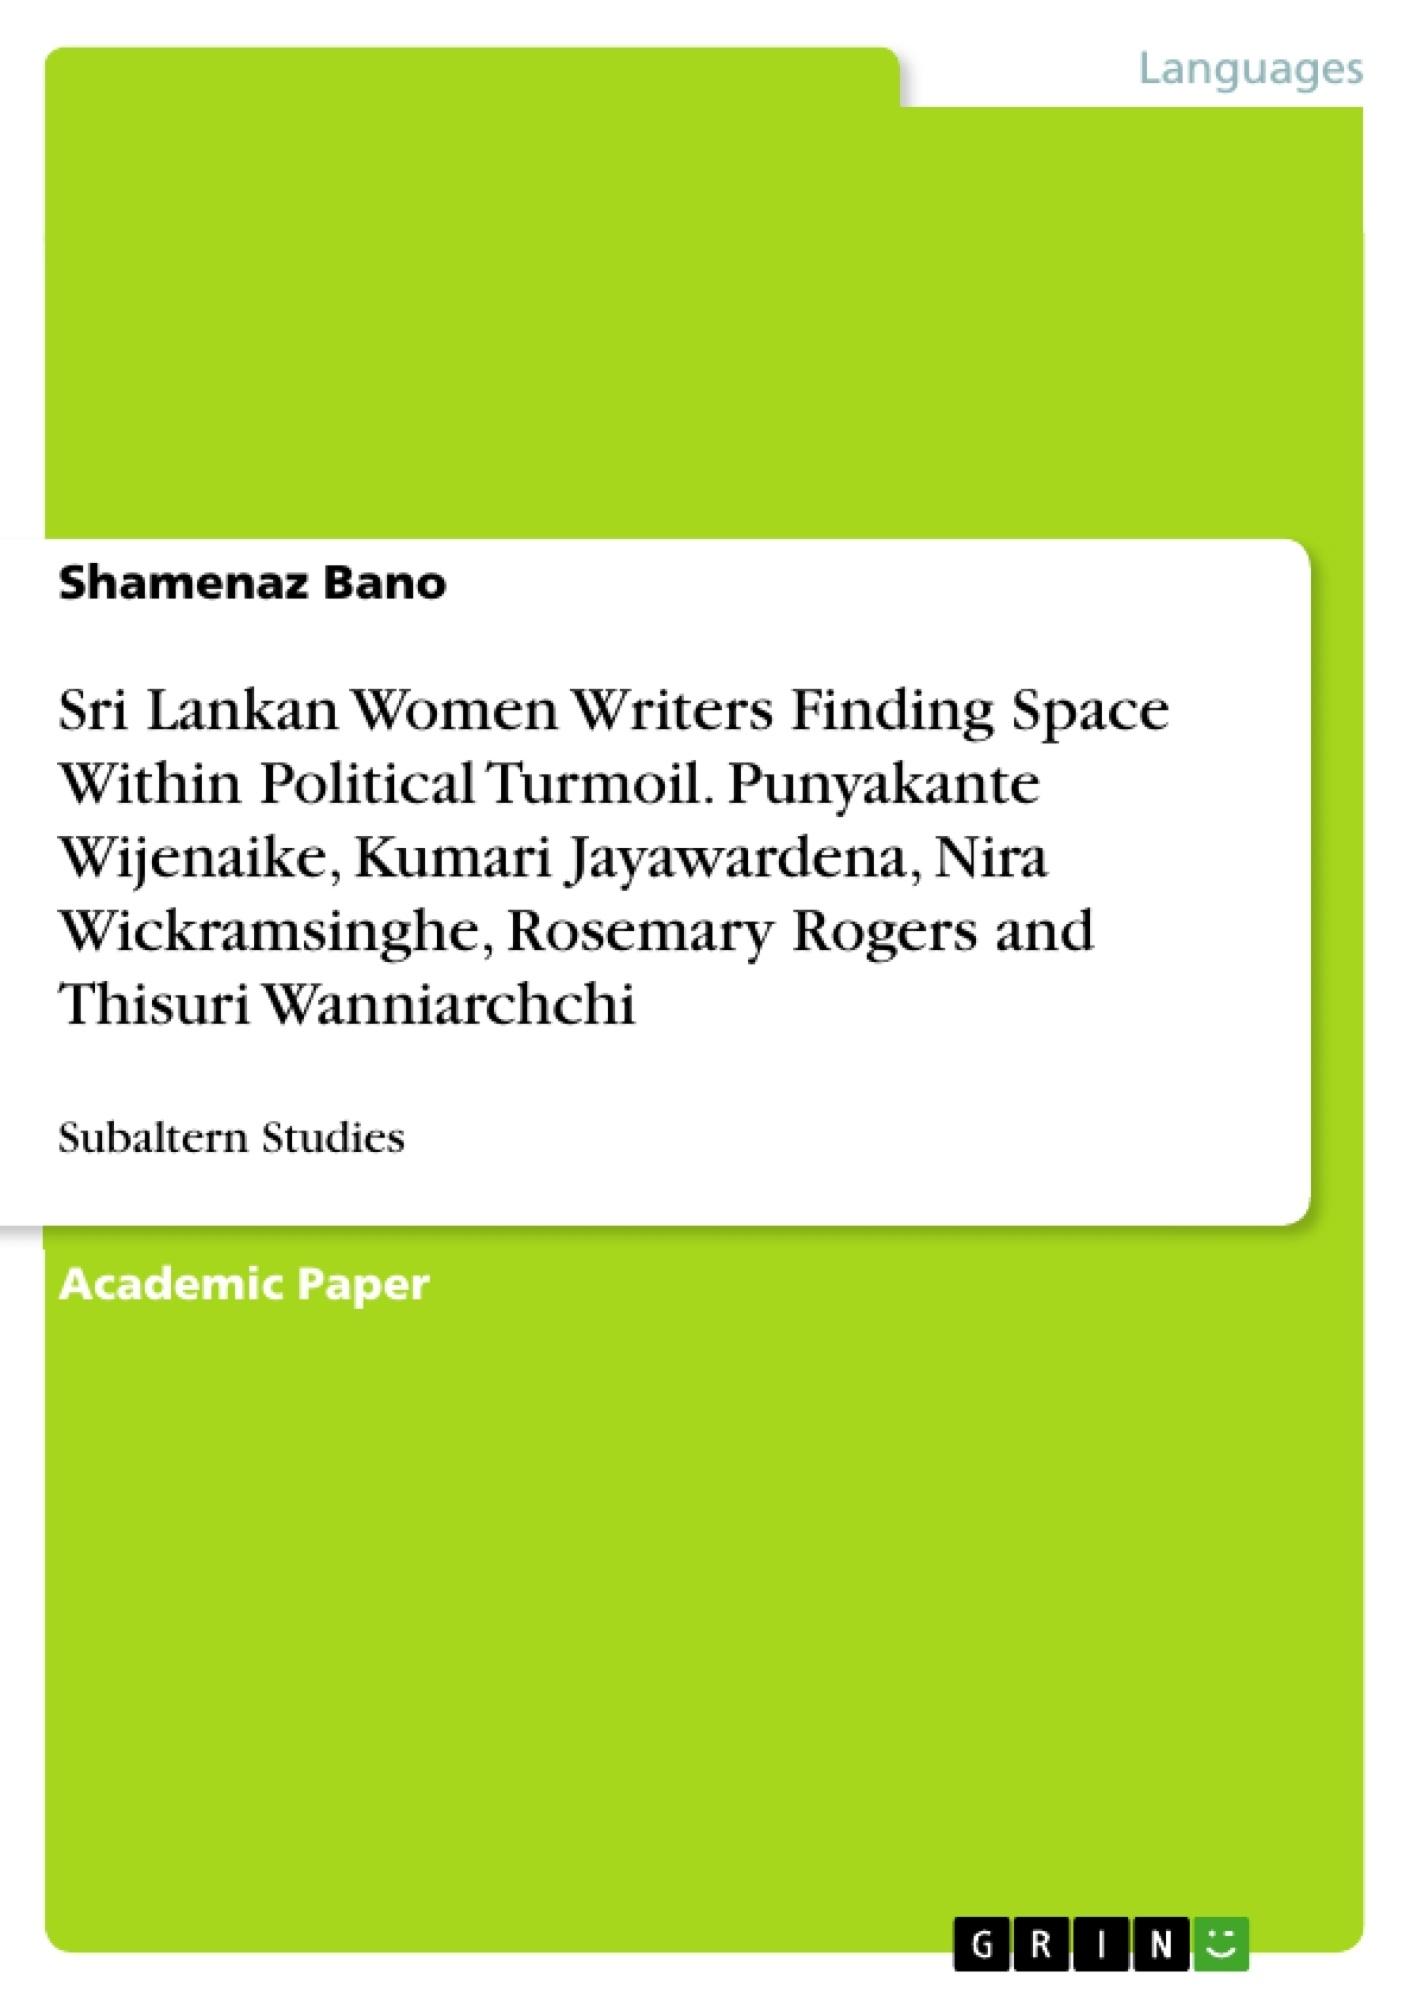 Title: Sri Lankan Women Writers Finding Space Within Political Turmoil. Punyakante Wijenaike, Kumari Jayawardena, Nira Wickramsinghe, Rosemary Rogers and Thisuri Wanniarchchi